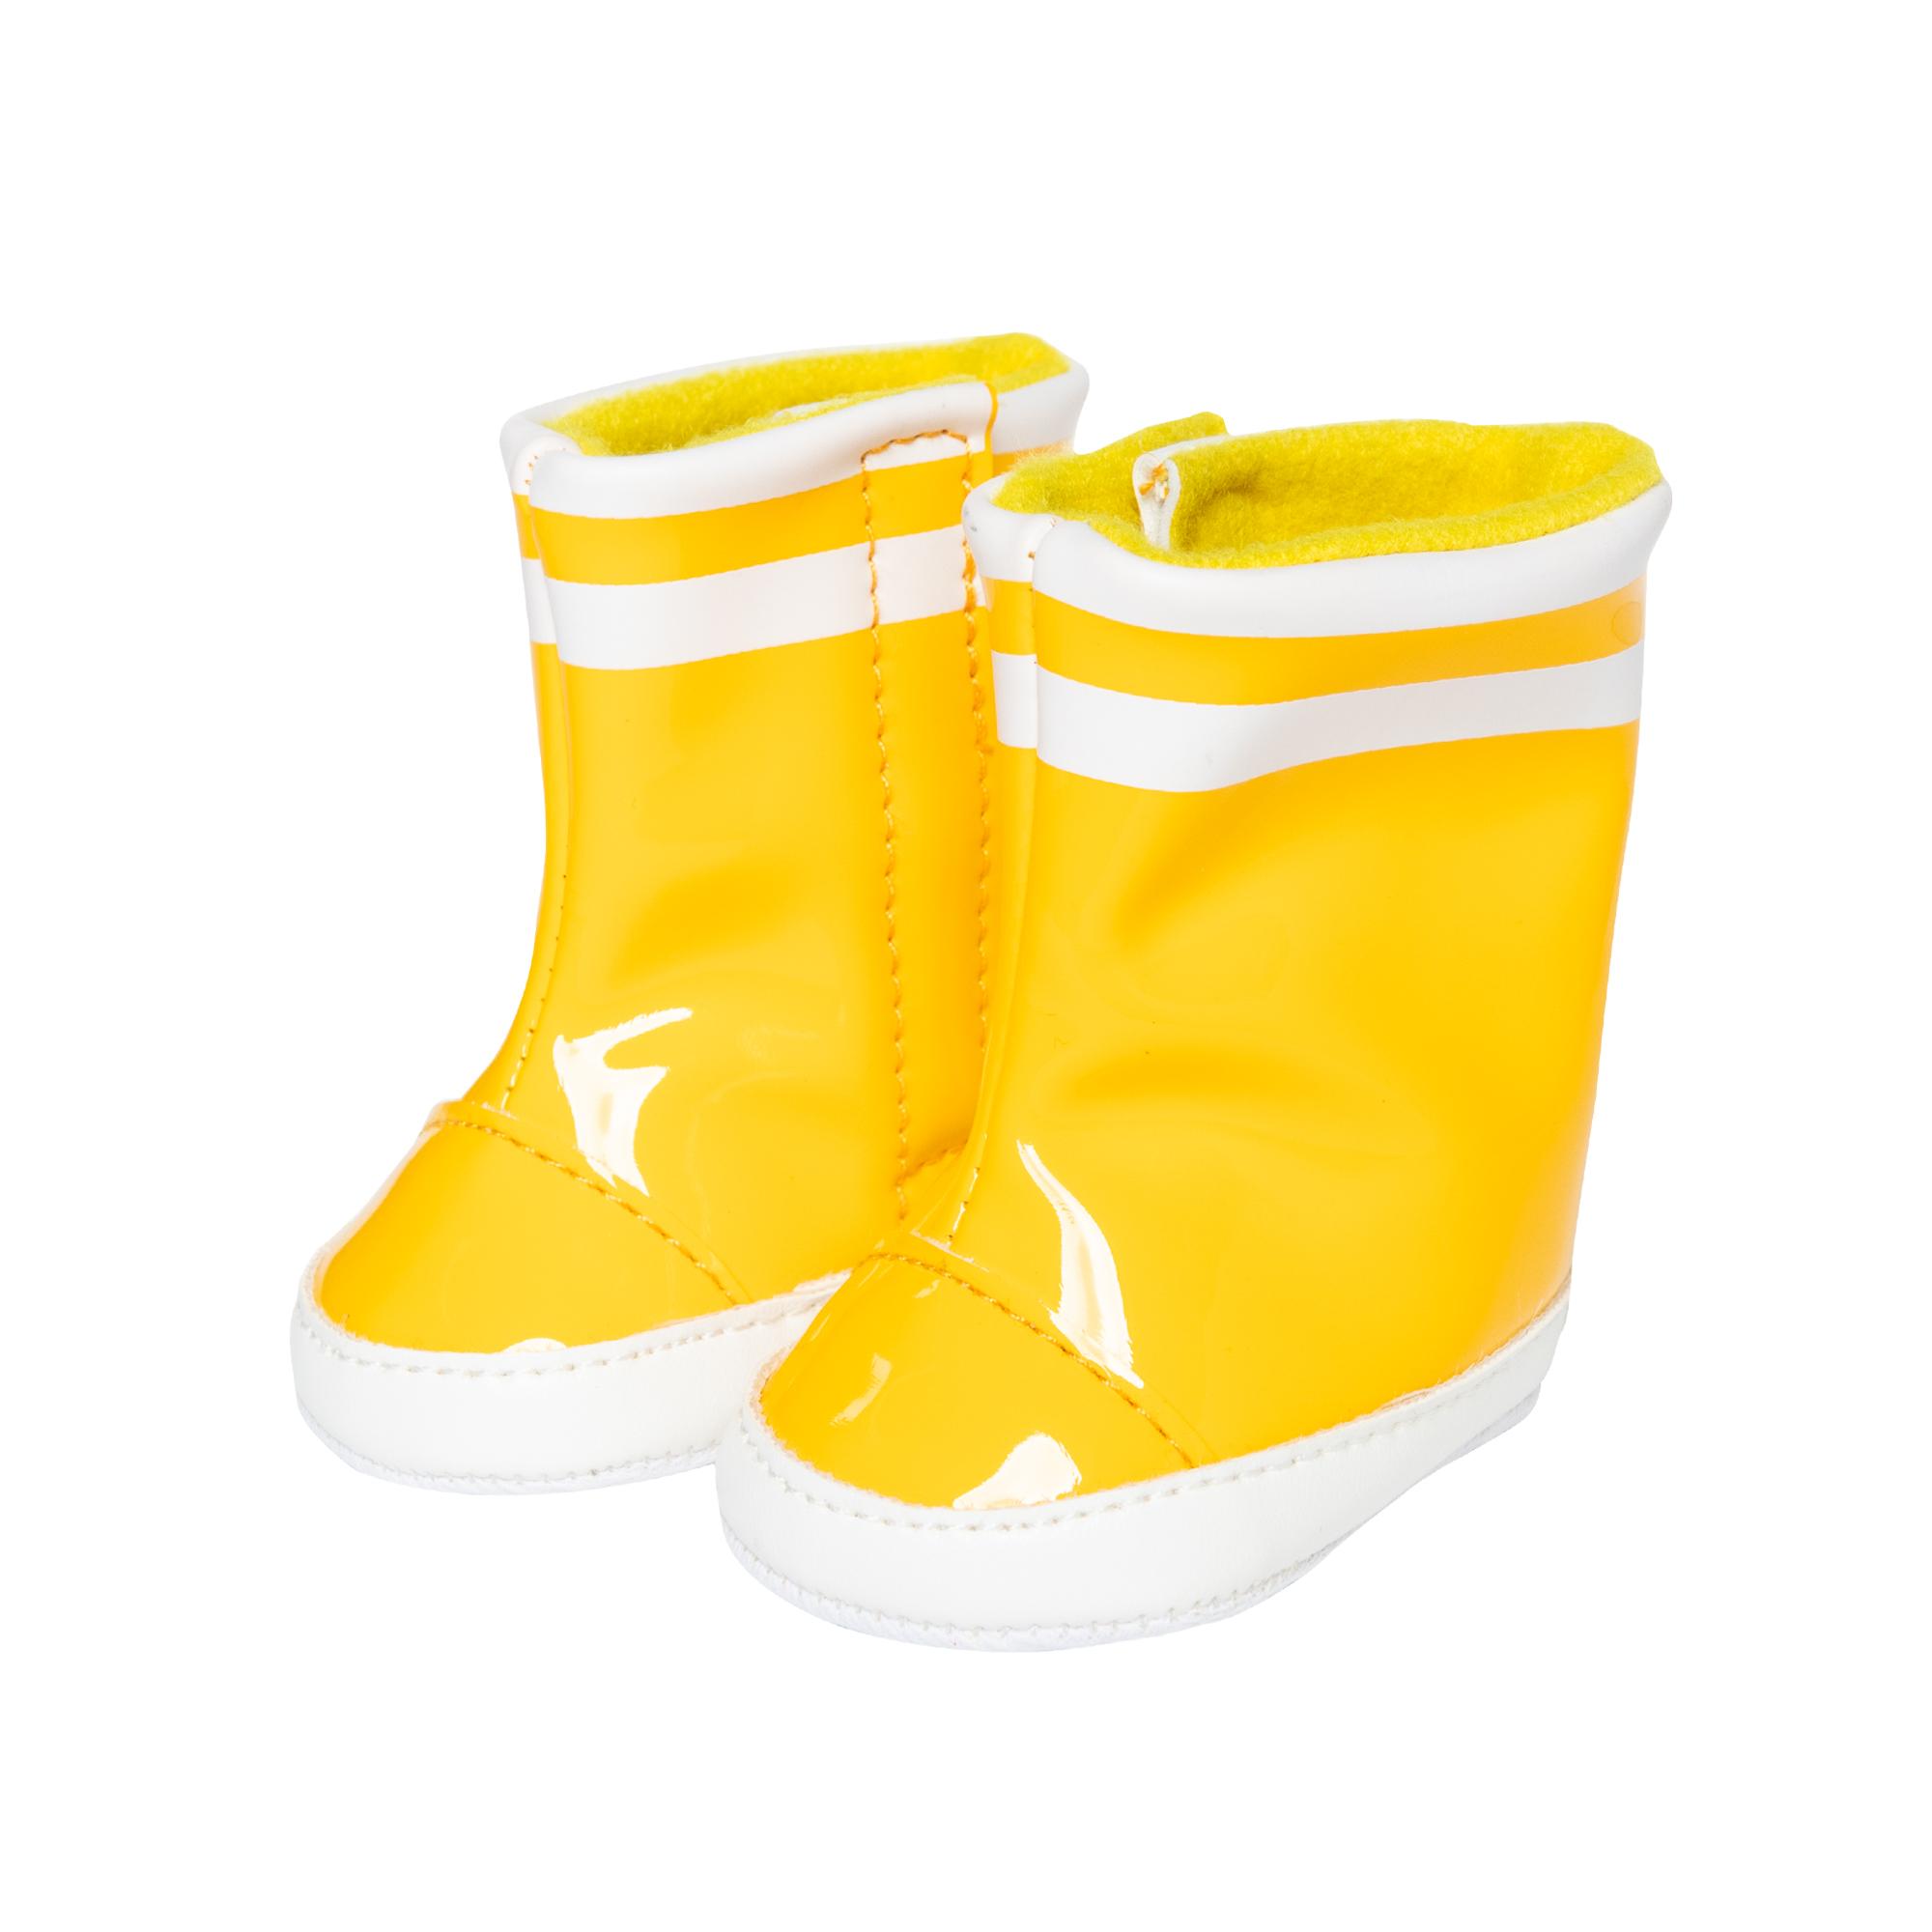 Gummistiefel, gelb, Gr. 38-45 cm